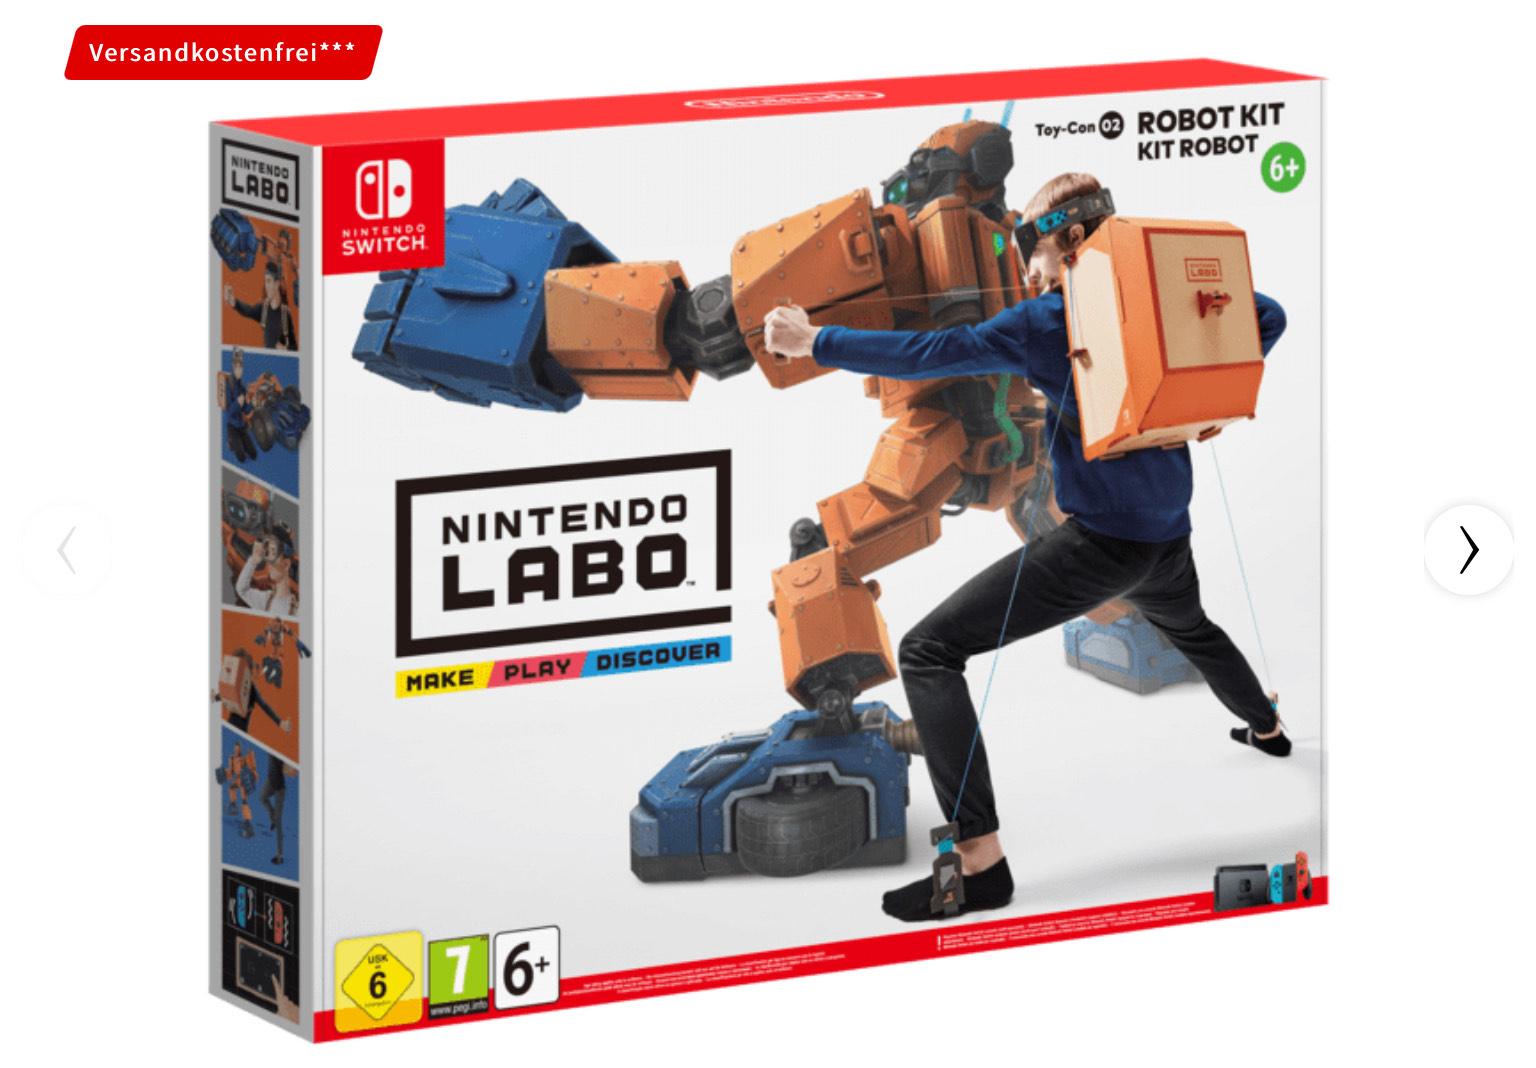 Nintendo Labo - SAMMELDEAL [Media Markt & Saturn]